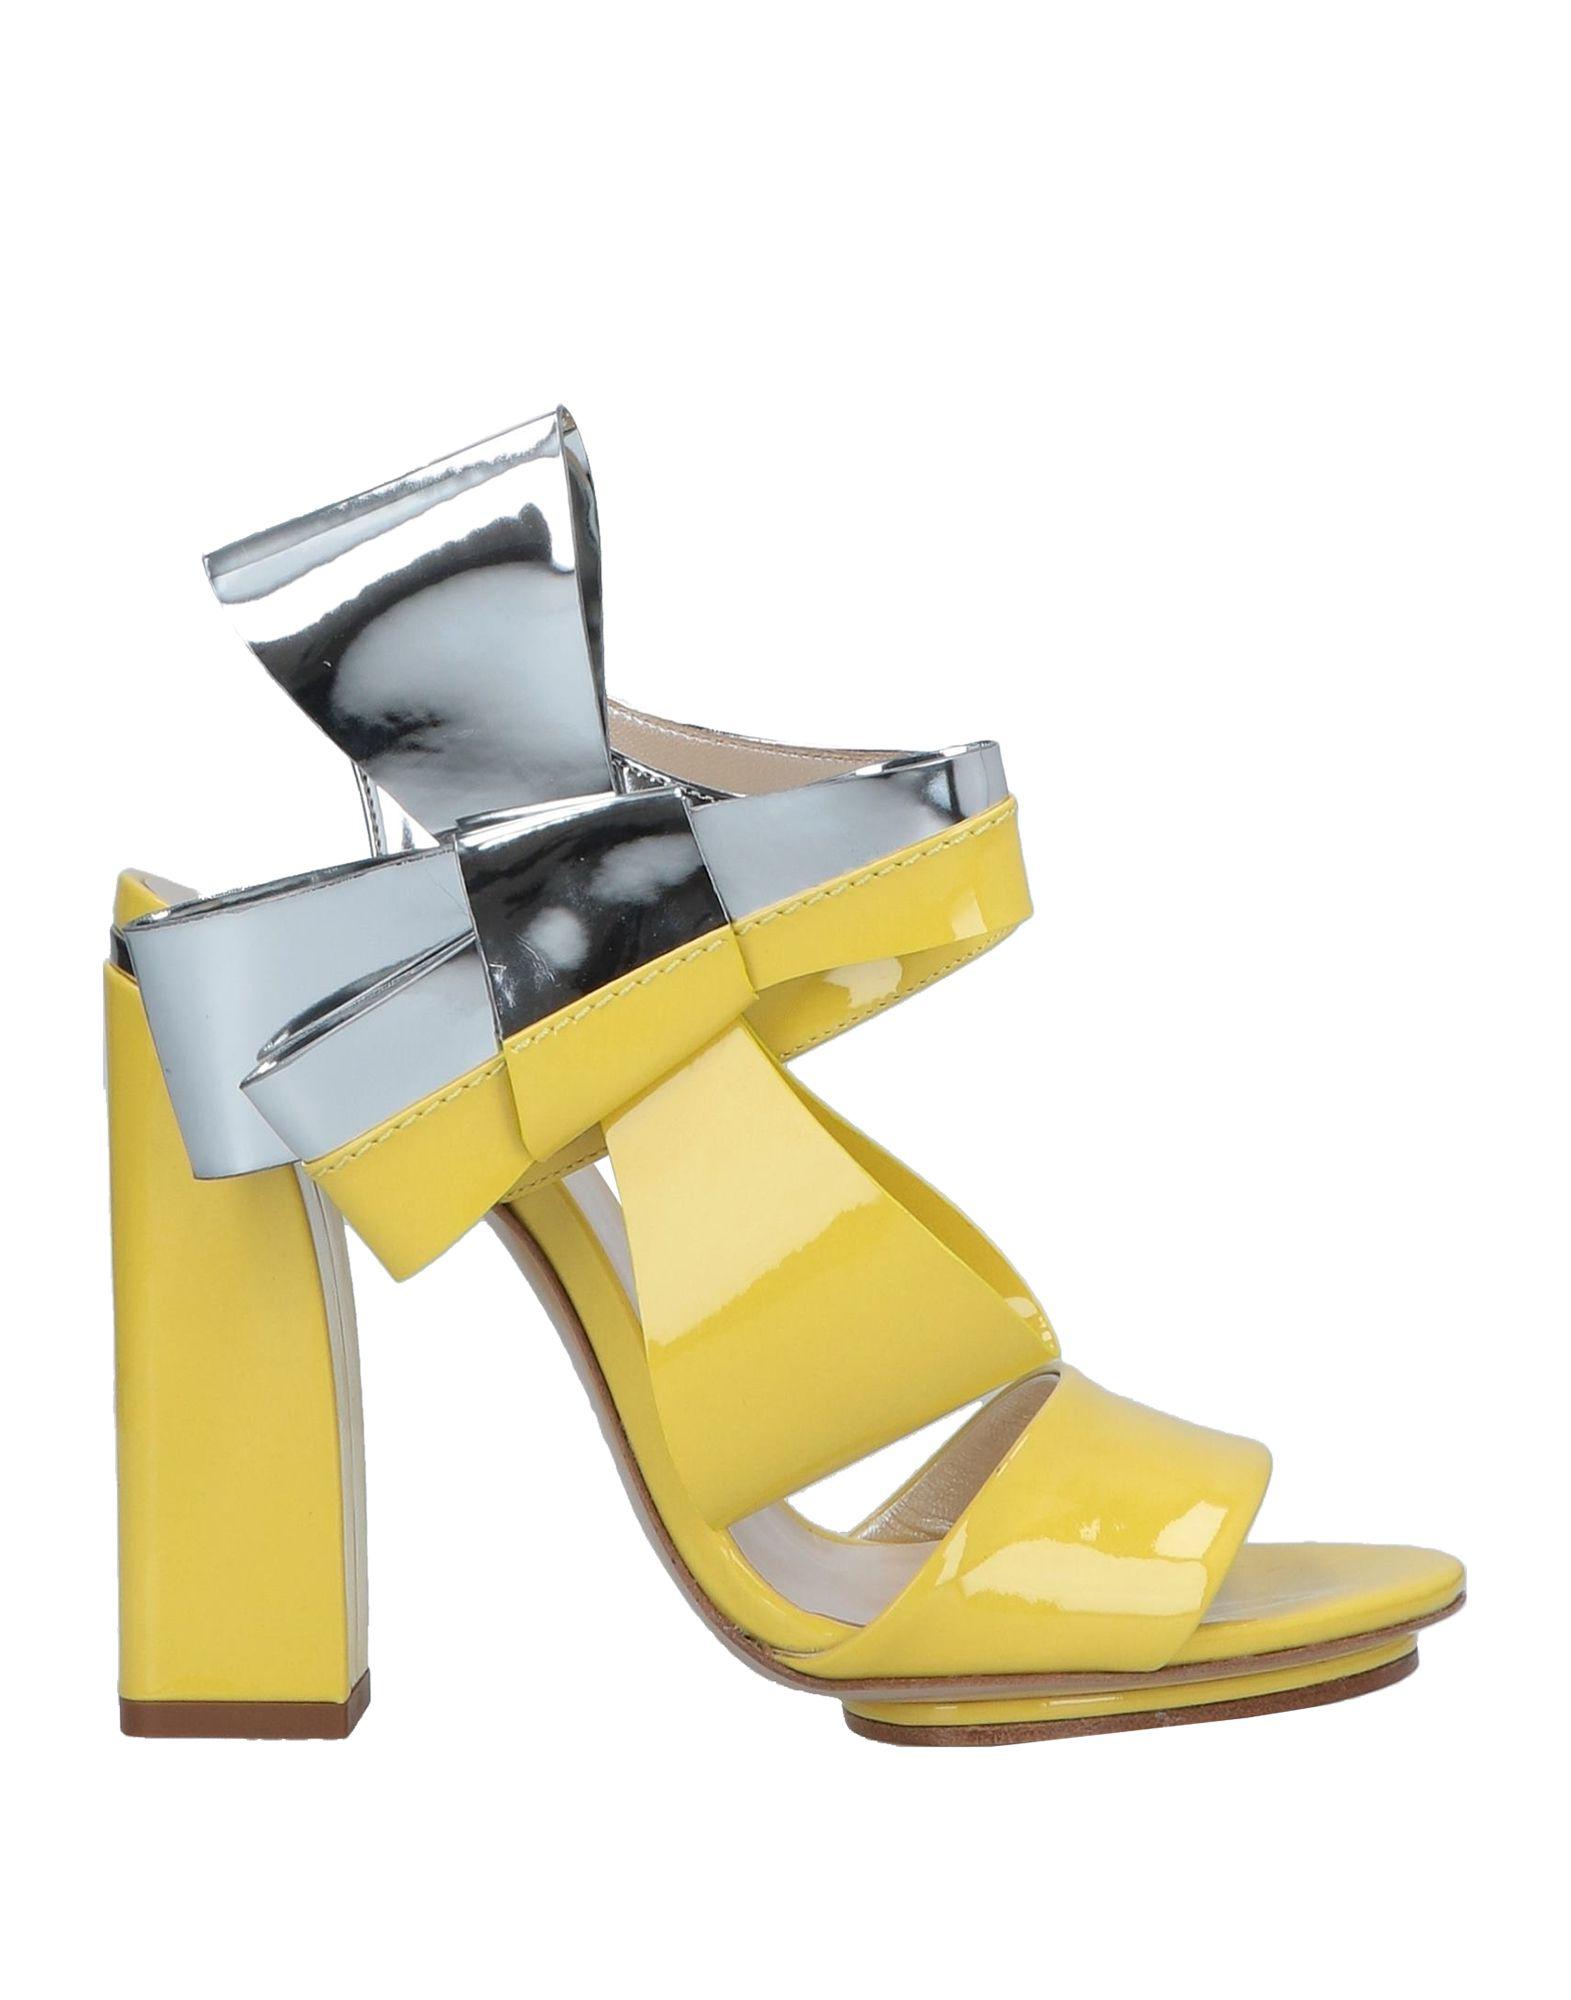 DELPOZO | DELPOZO Sandals 11691594 | Goxip